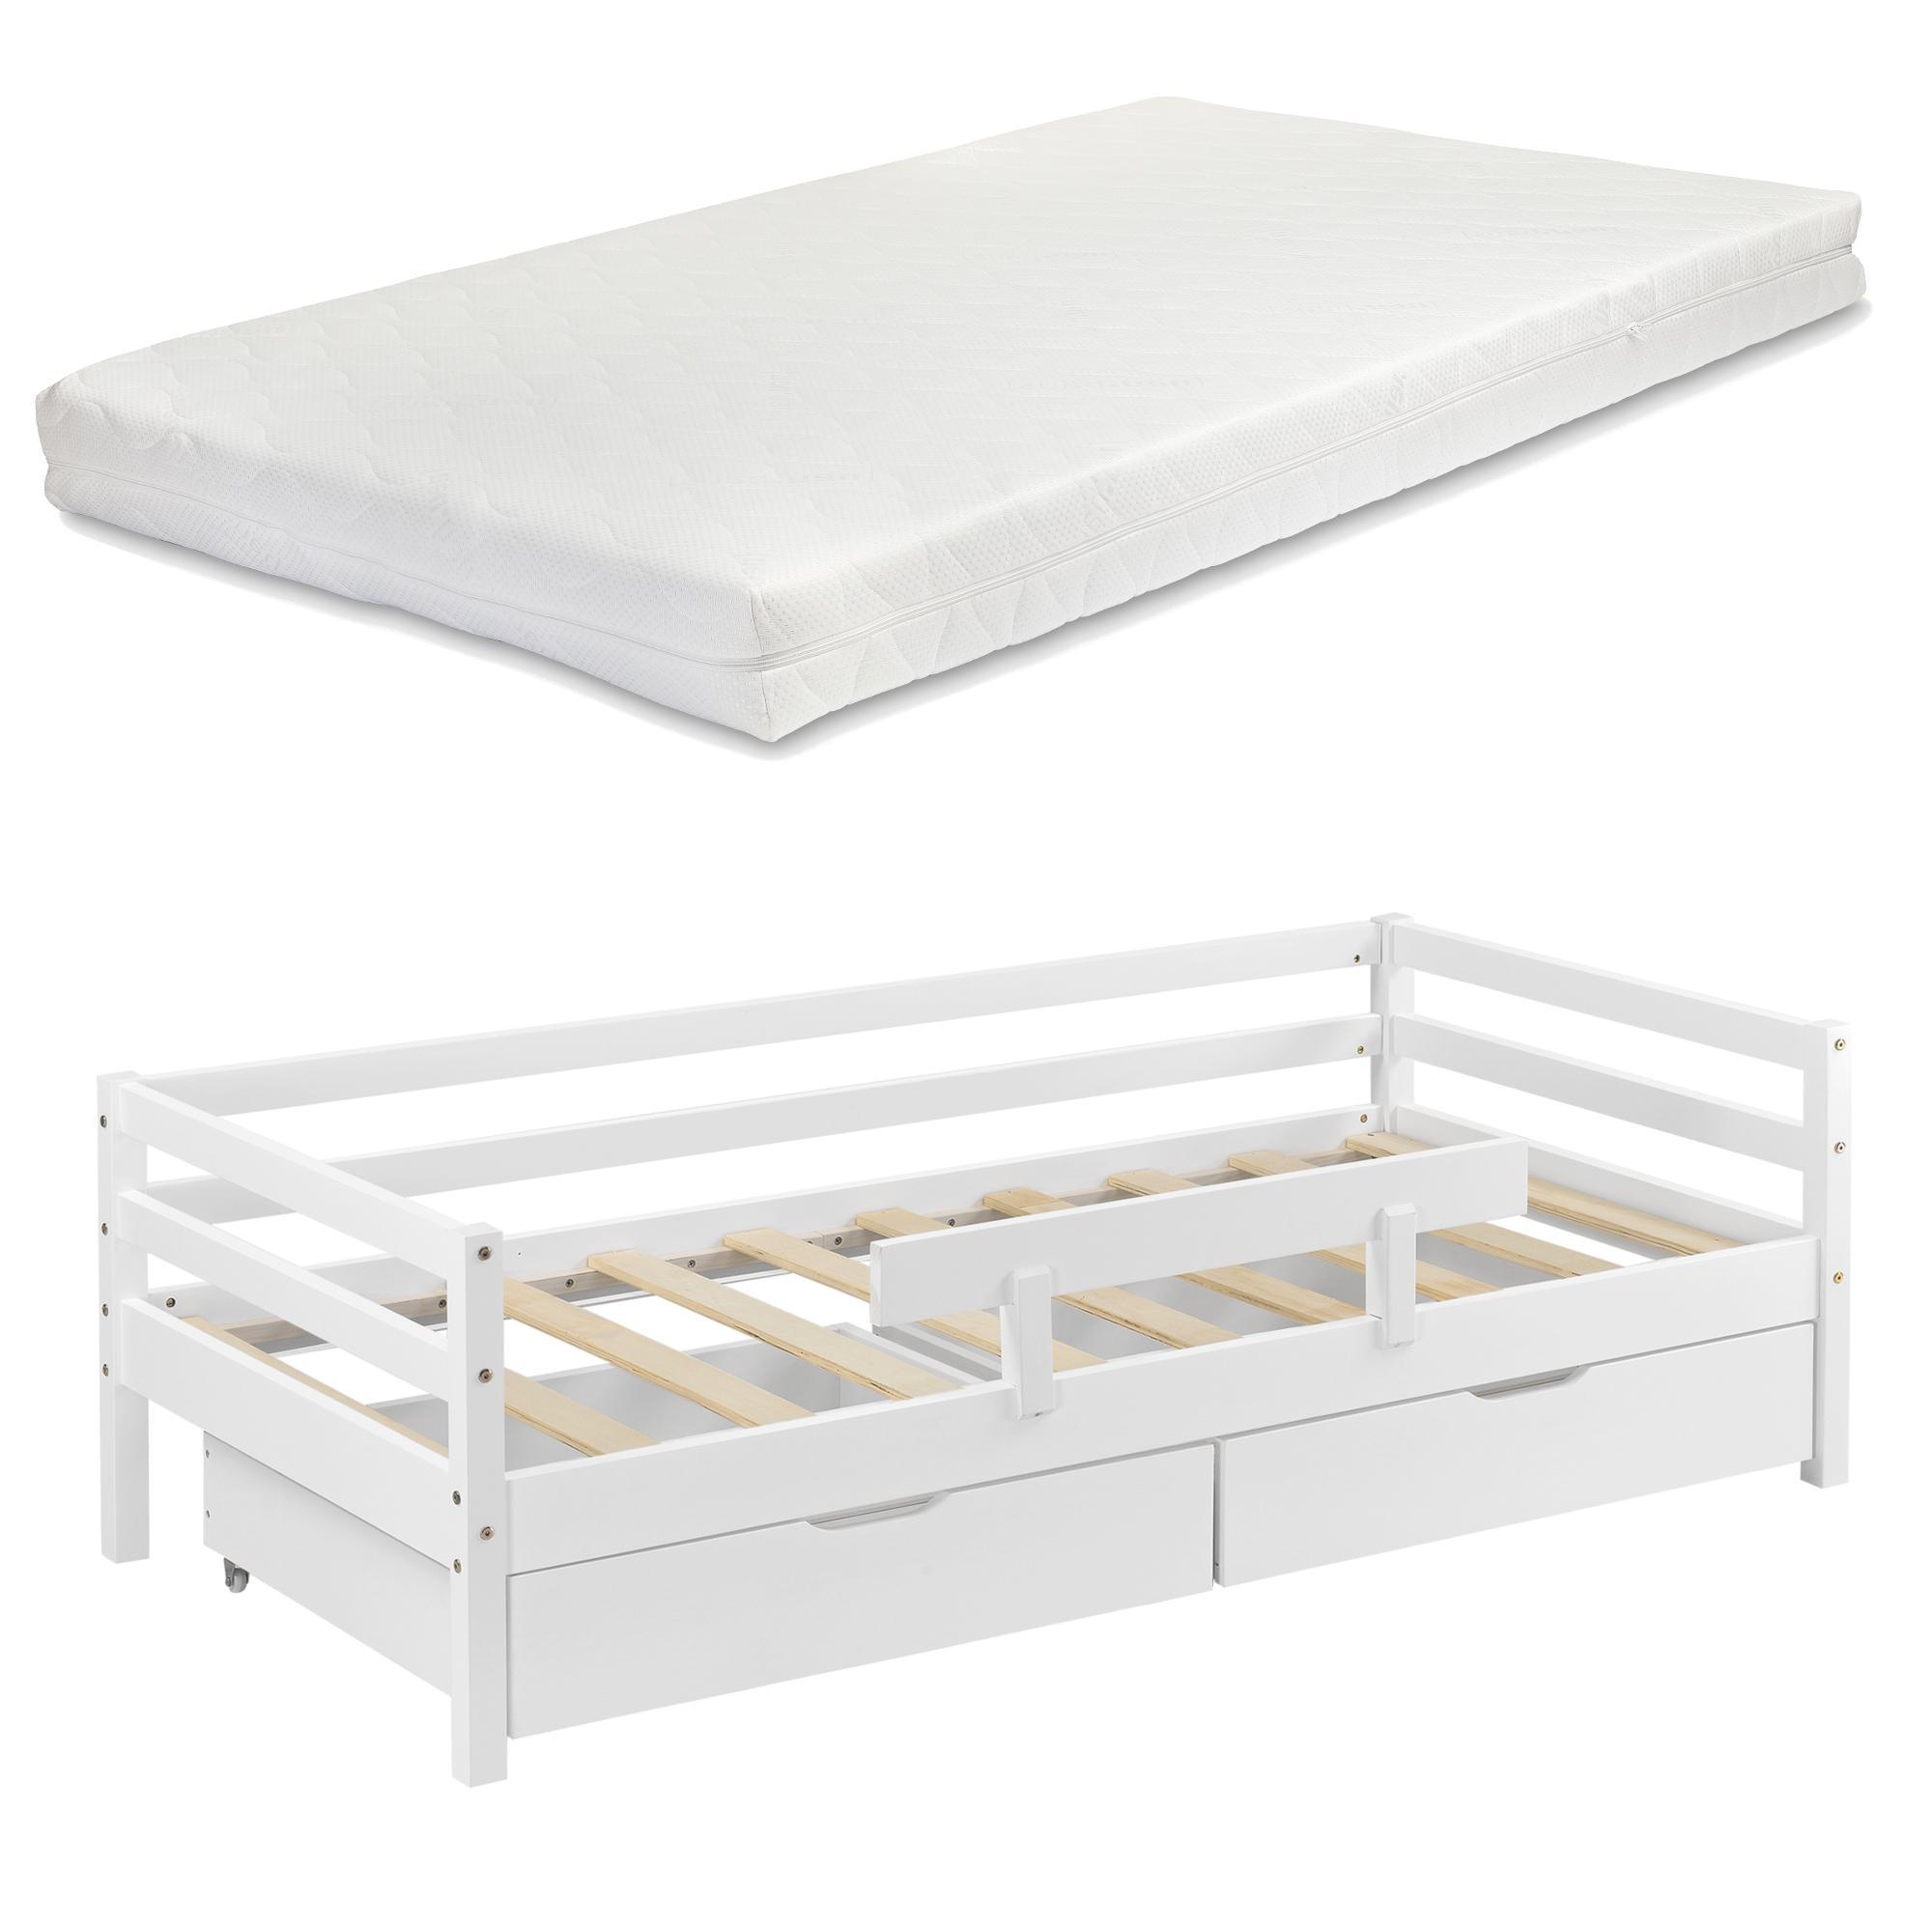 [en.casa] Detská posteľ REYKHOLT AAKB-8741 90x200 cm biela s matracom